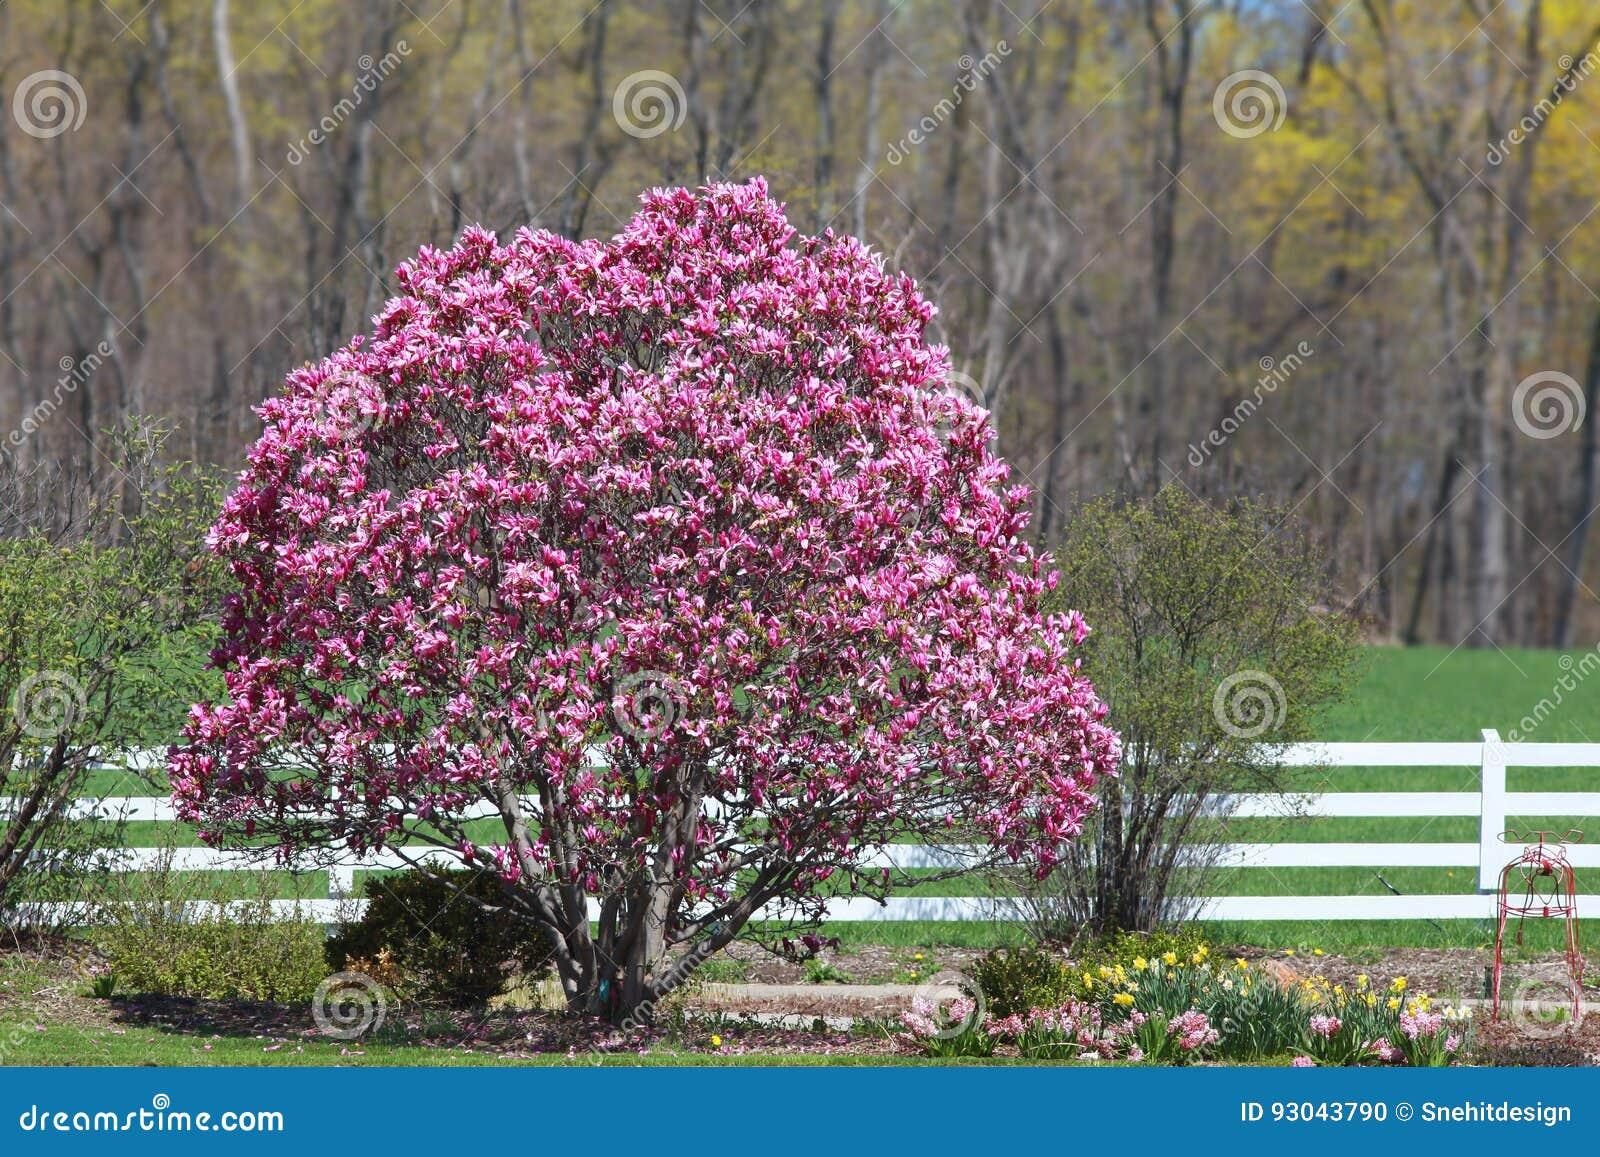 Magnolia Tree Stock Photo Image Of Bloom Contrasts 93043790